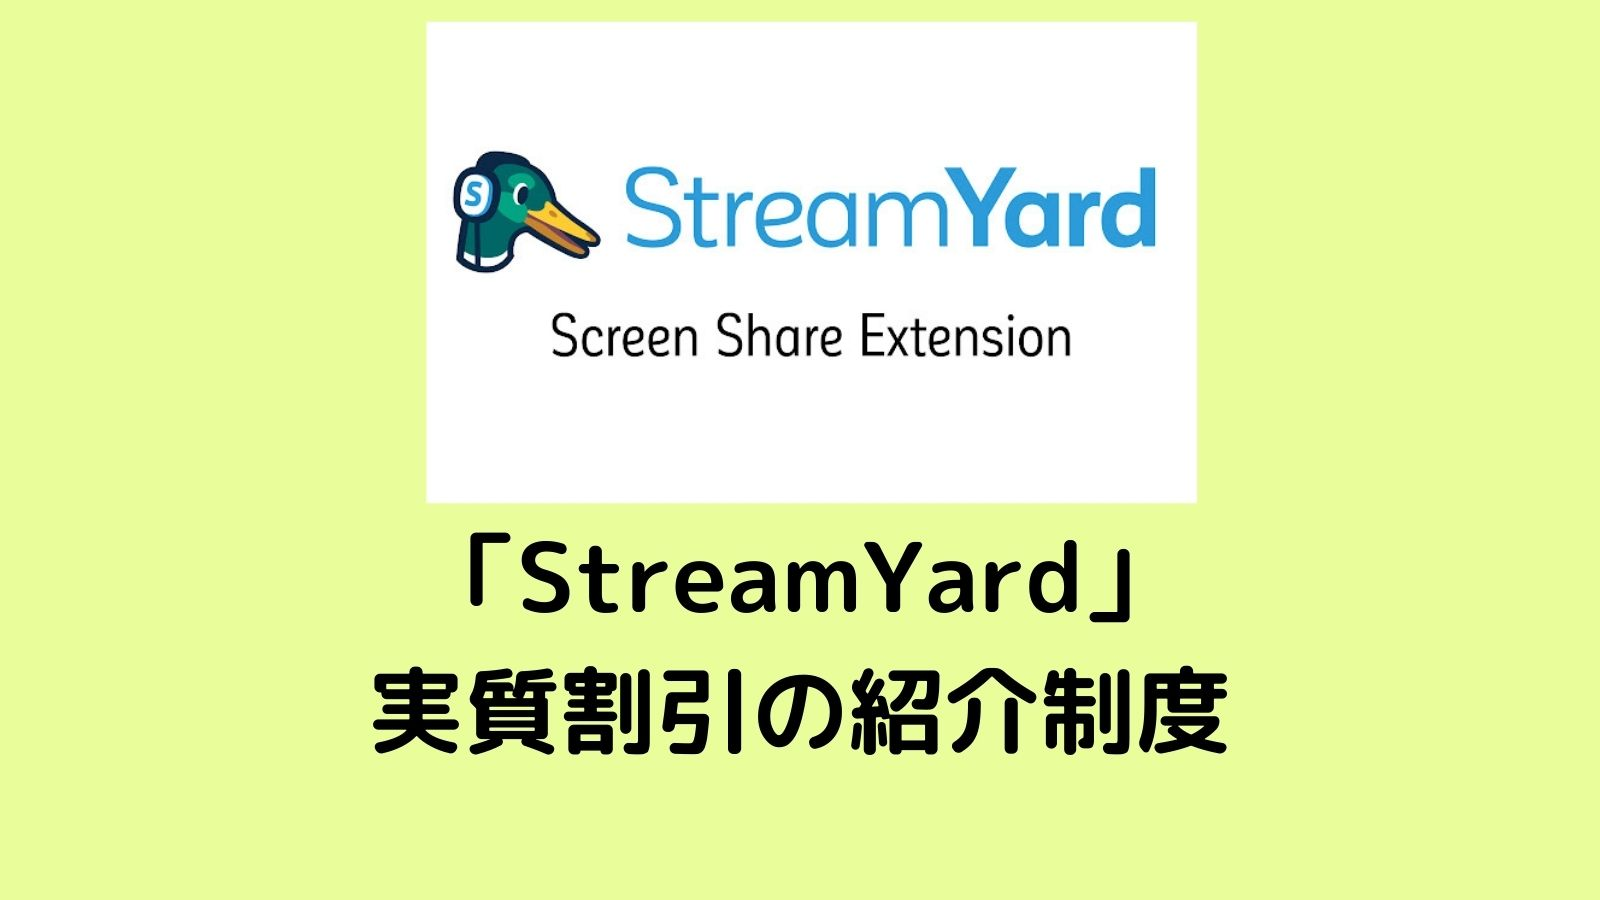 StreamYardには割引があるのか?有料プラン料金を節約できる紹介制度を活用しよう!